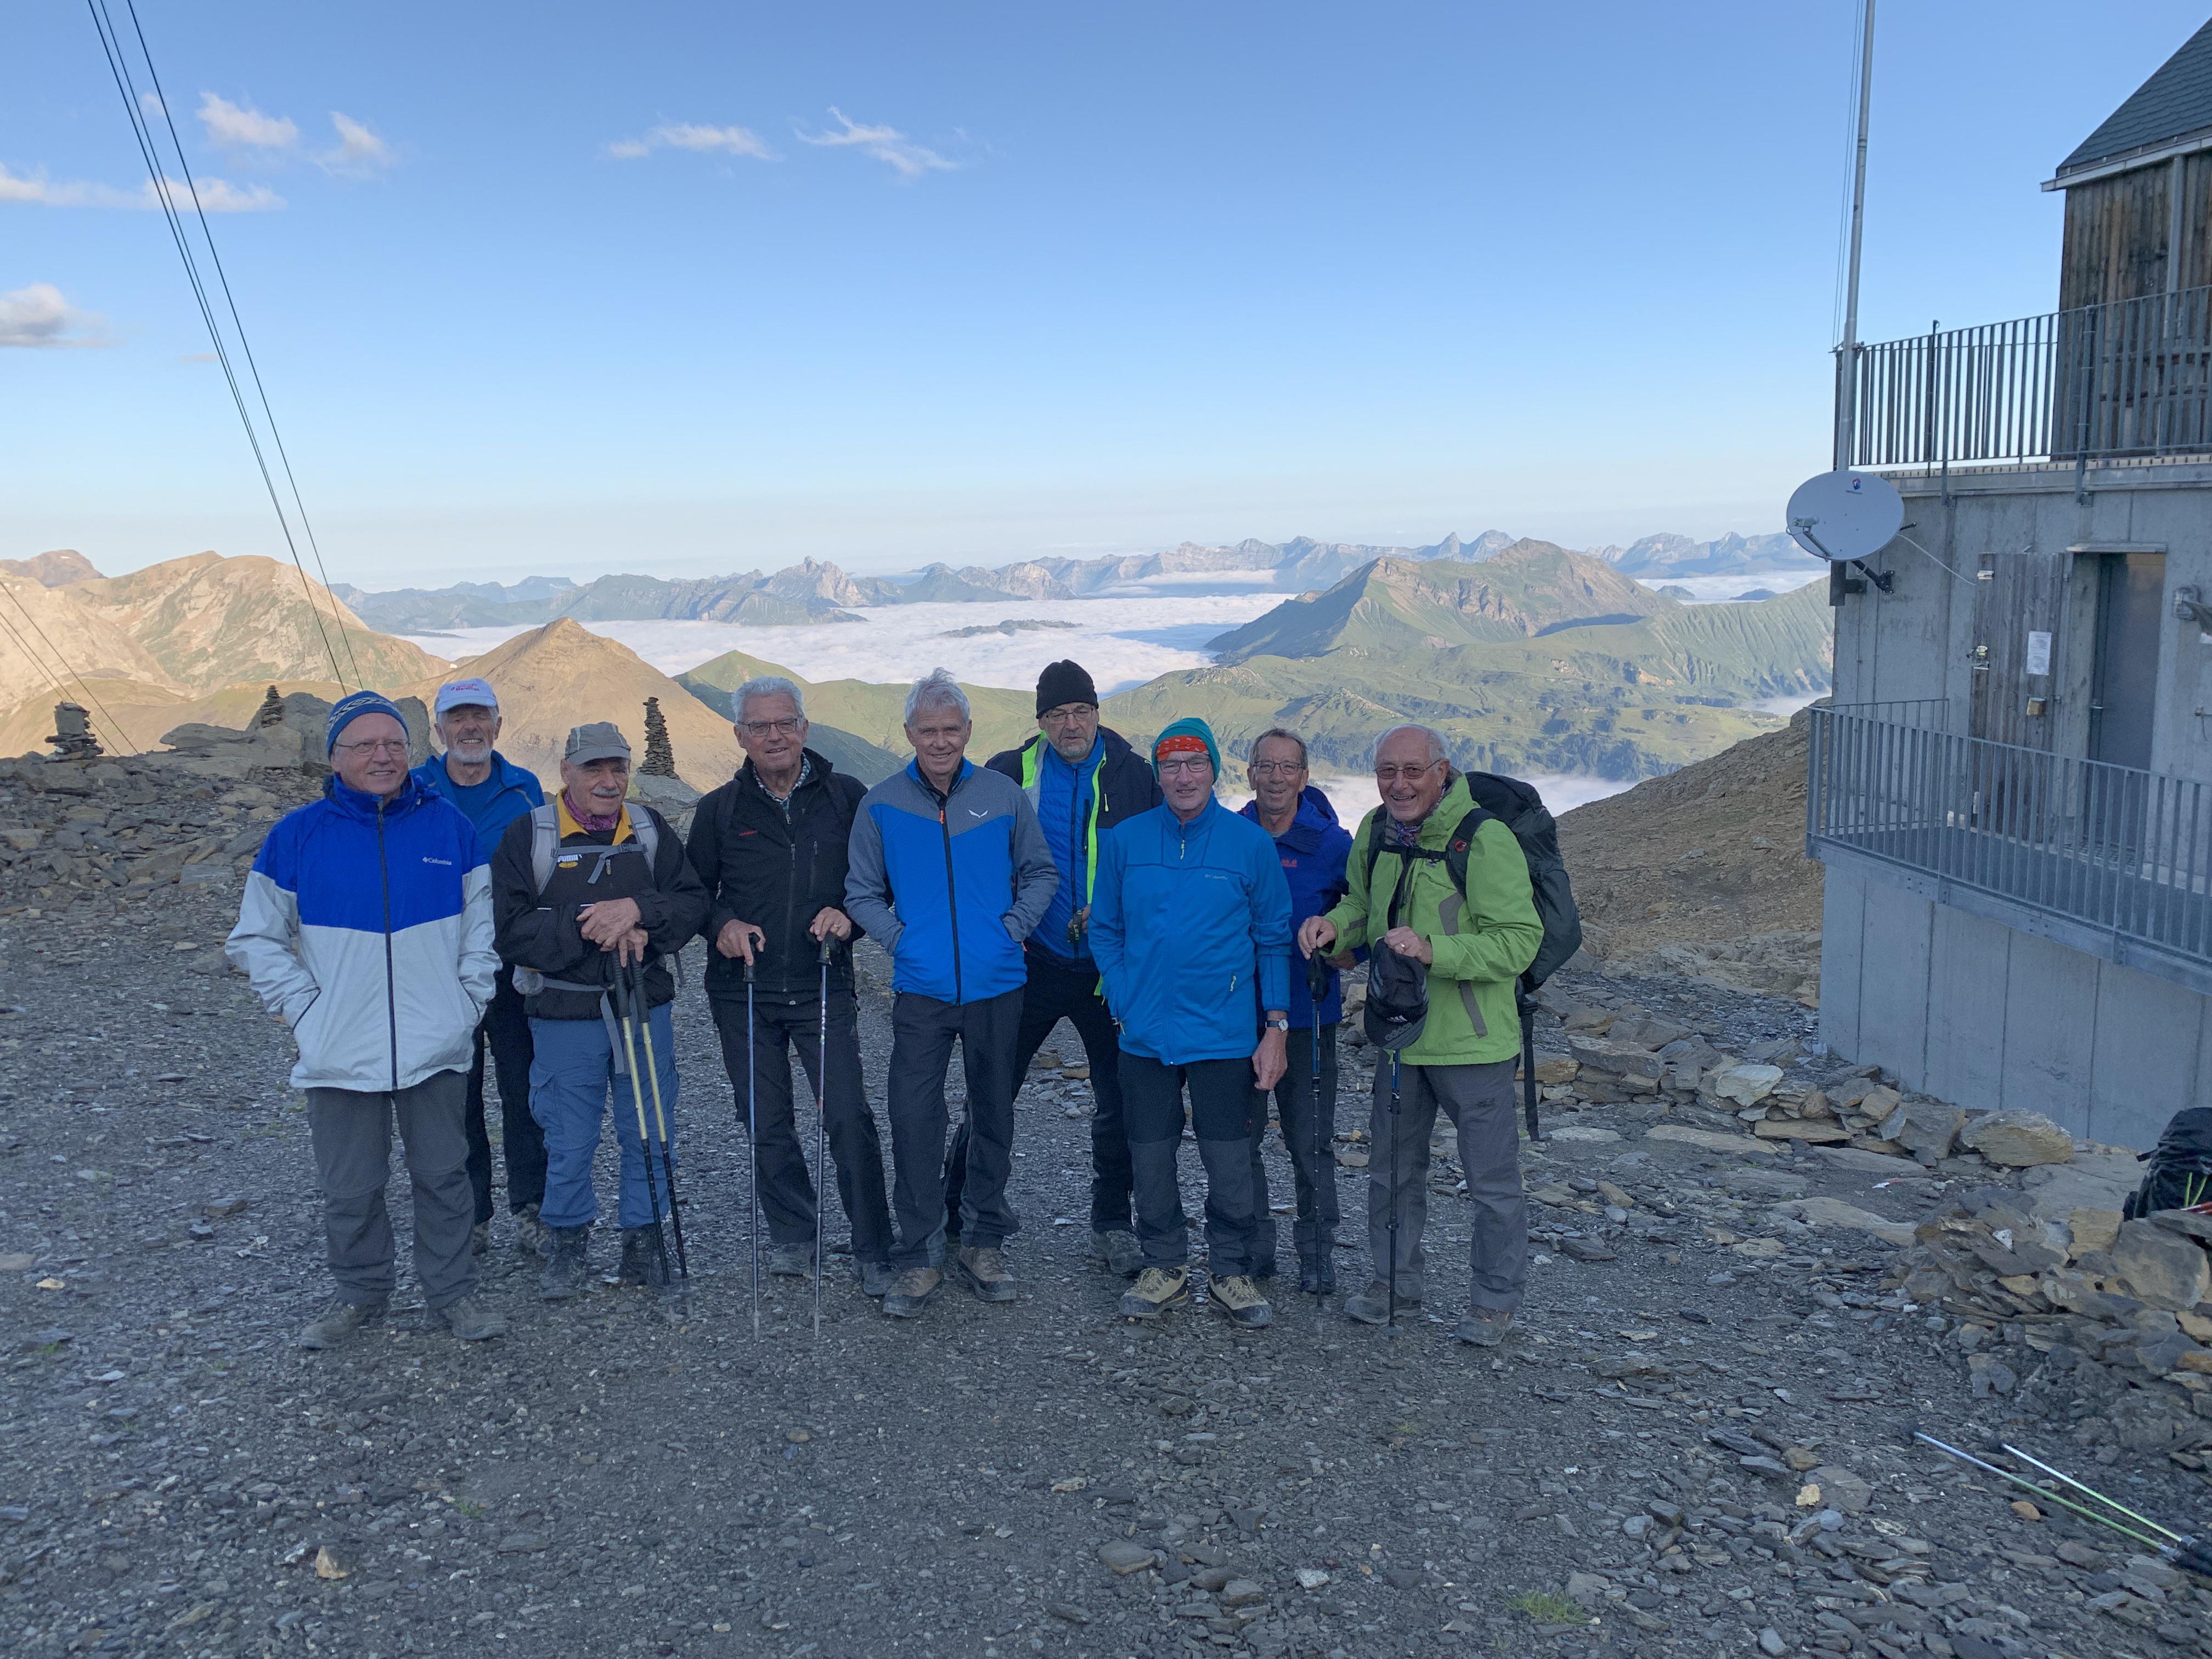 2021-08-25 Röstigraben 23. Etappe Wildstrubelhütte - Montana